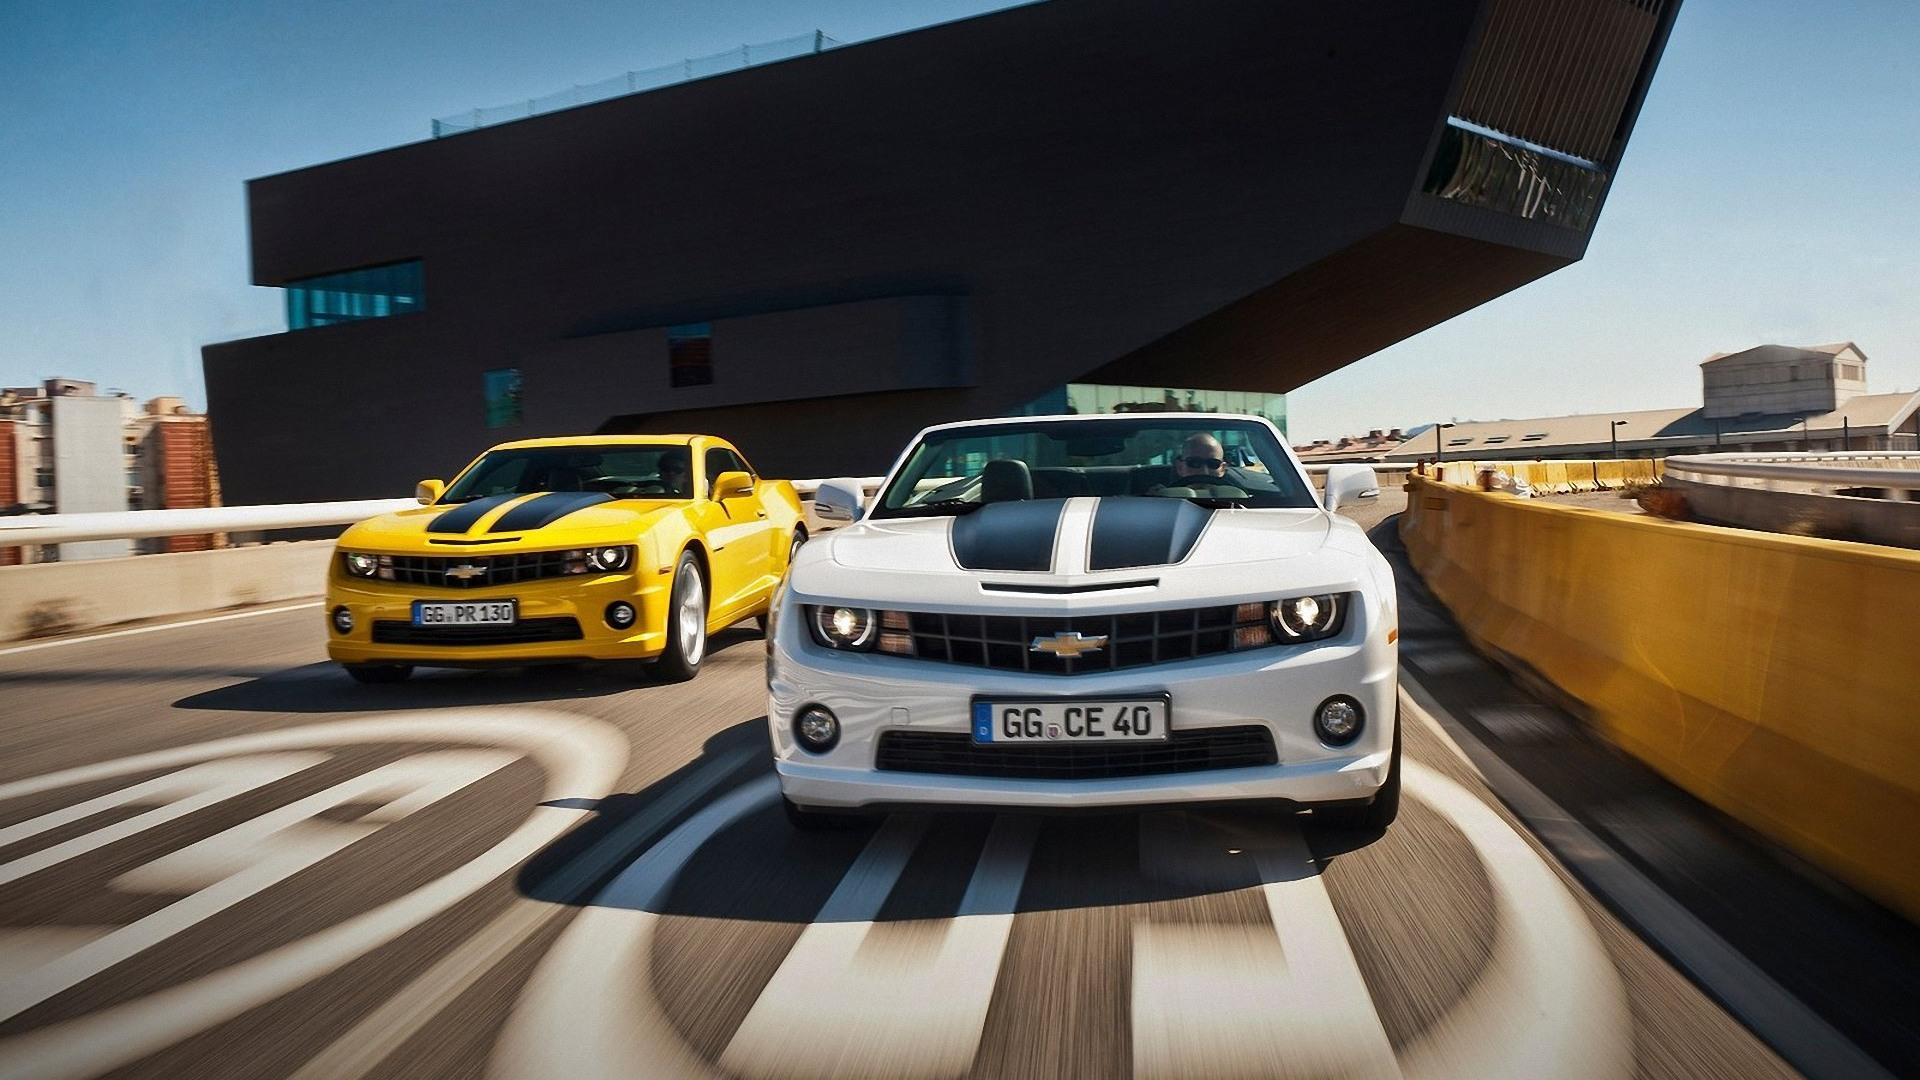 Chevrolet Racing Cars Wallpaper Fullscreen